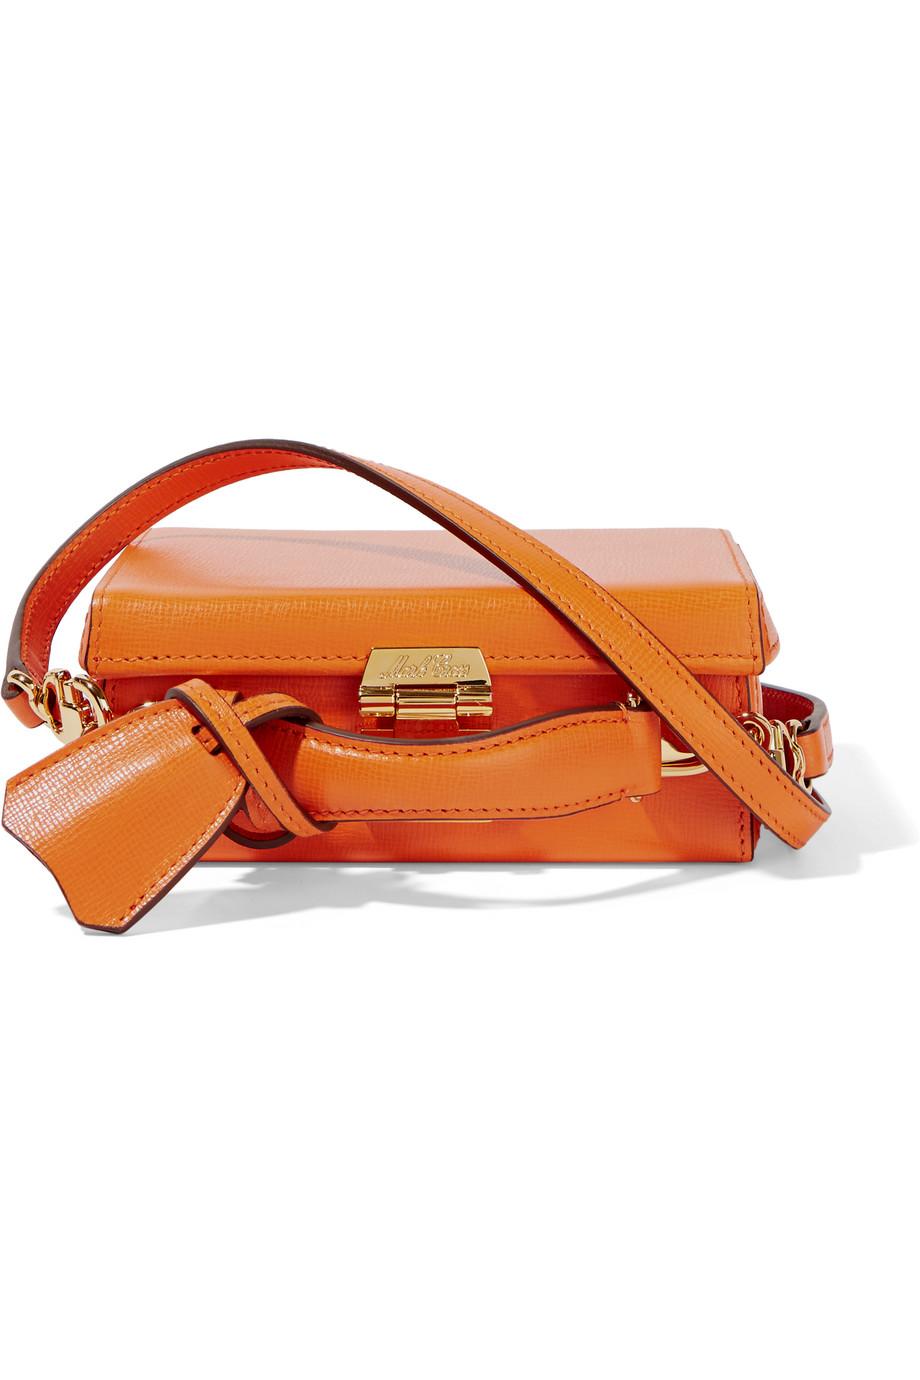 Mark Cross Grace Mini Textured-Leather Shoulder Bag, Orange, Women's